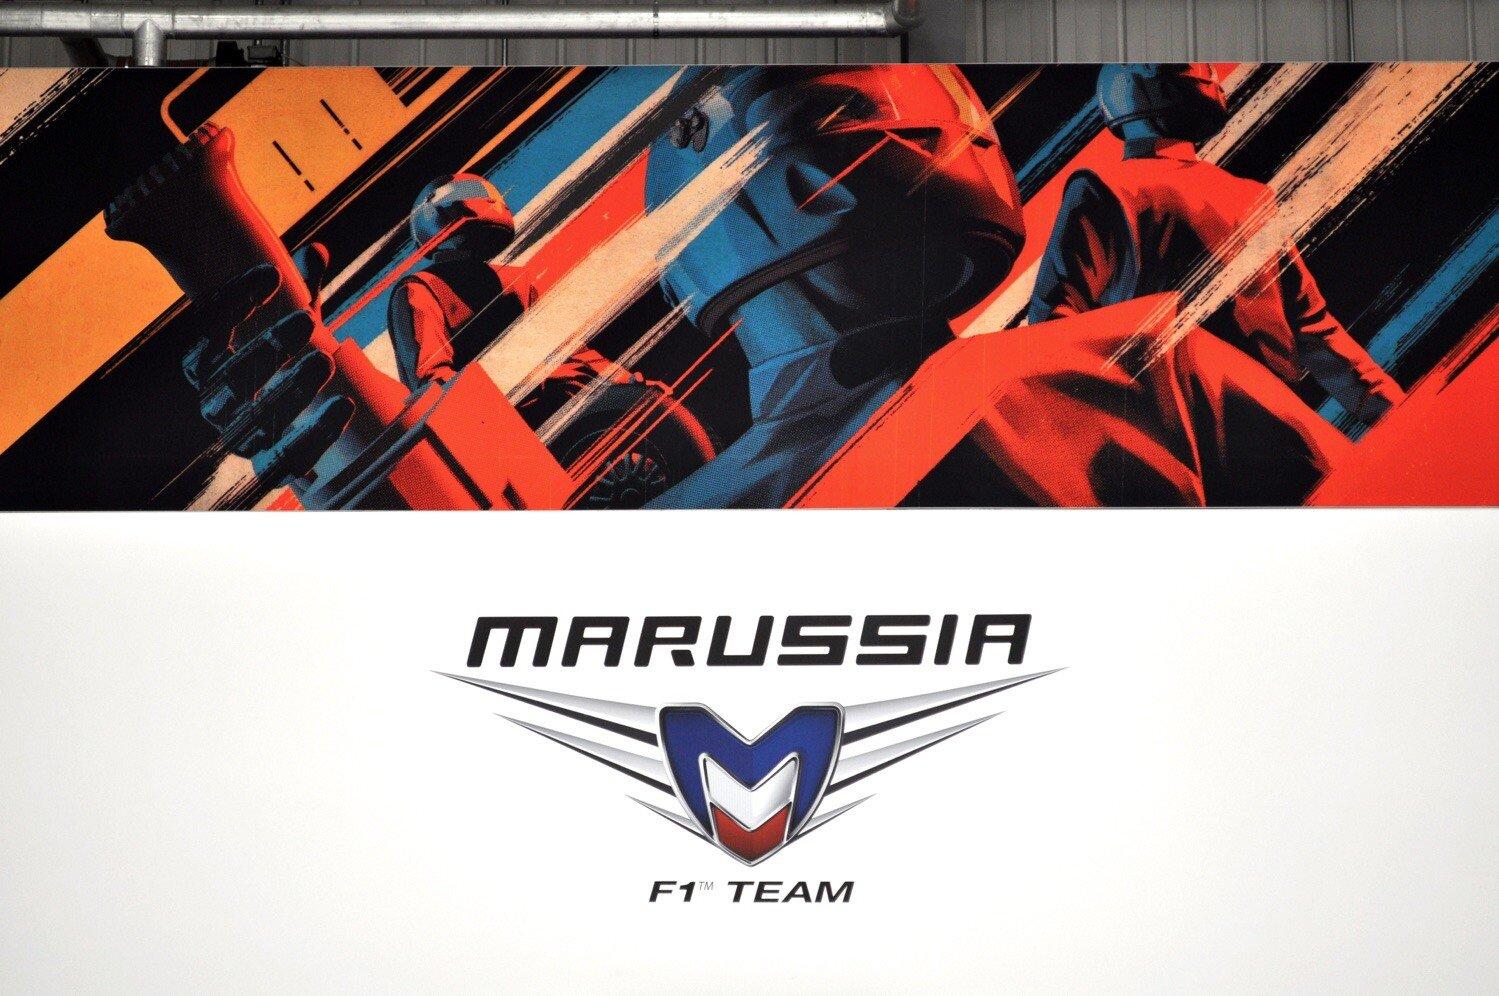 tavis-coburn-F1-team-graphic-illustration-marussia-34.jpg